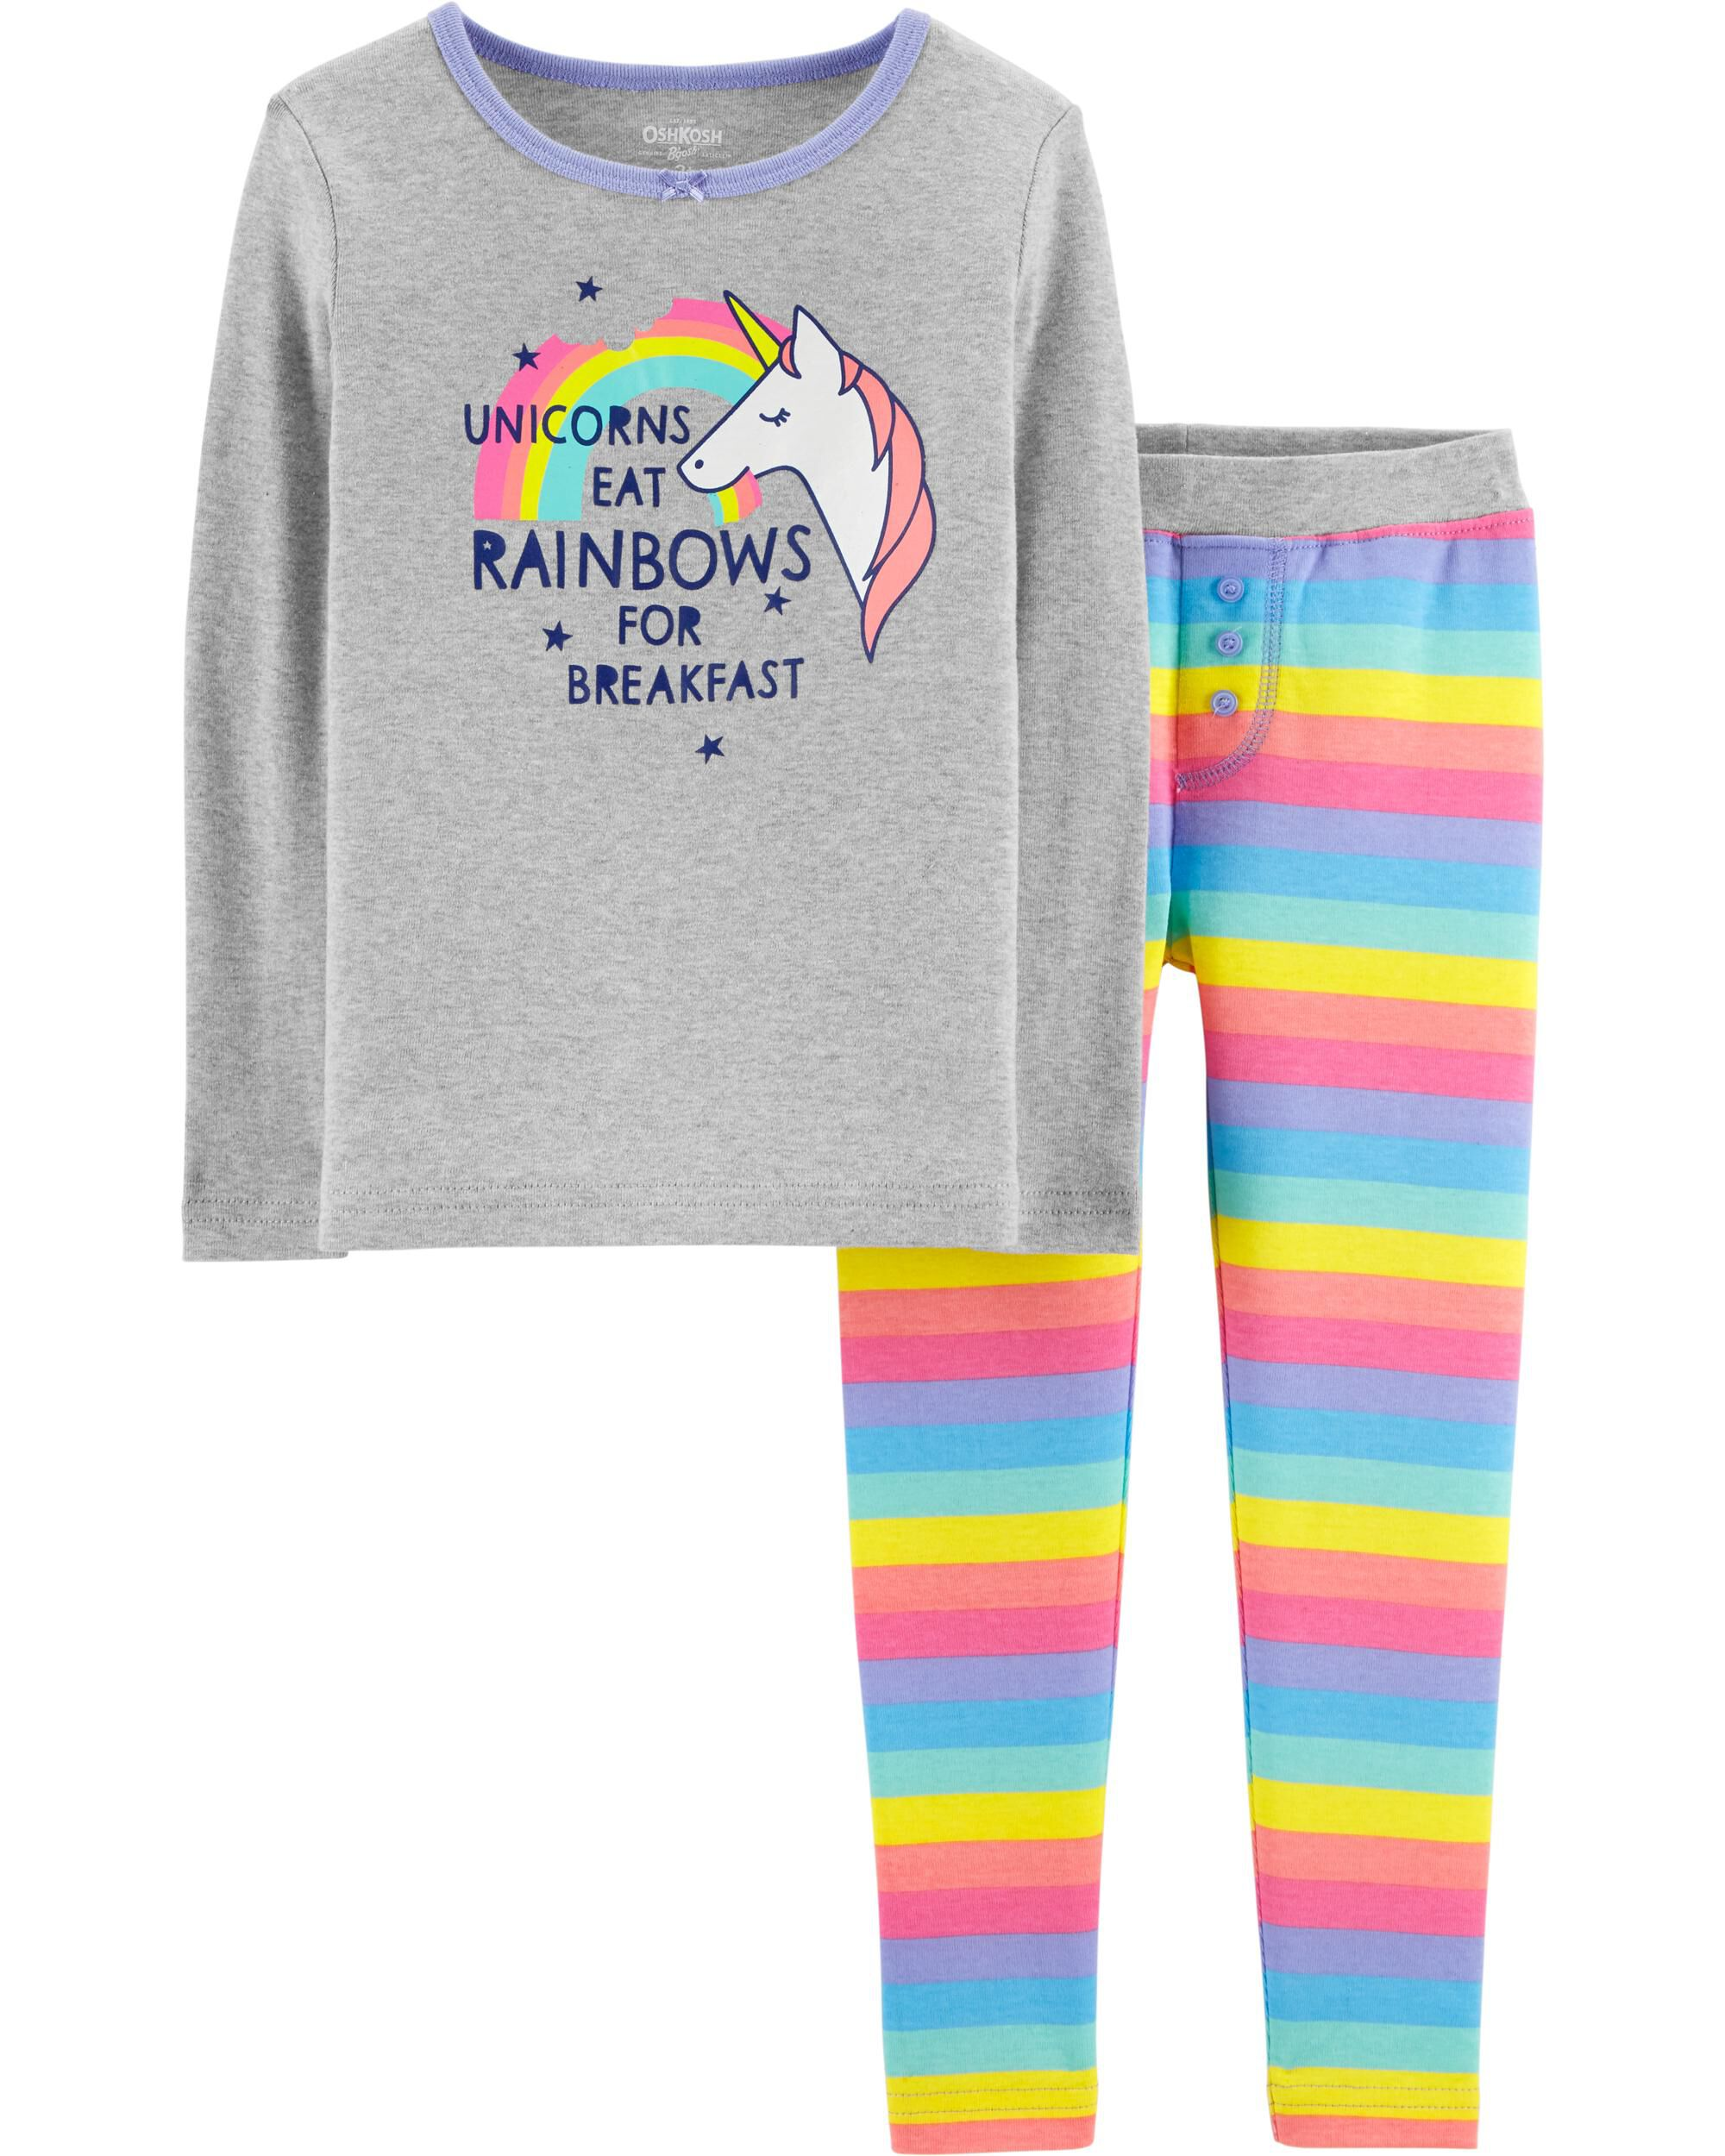 f71430c7f Snug Fit Rainbow Unicorn Cotton PJs | OshKosh.com